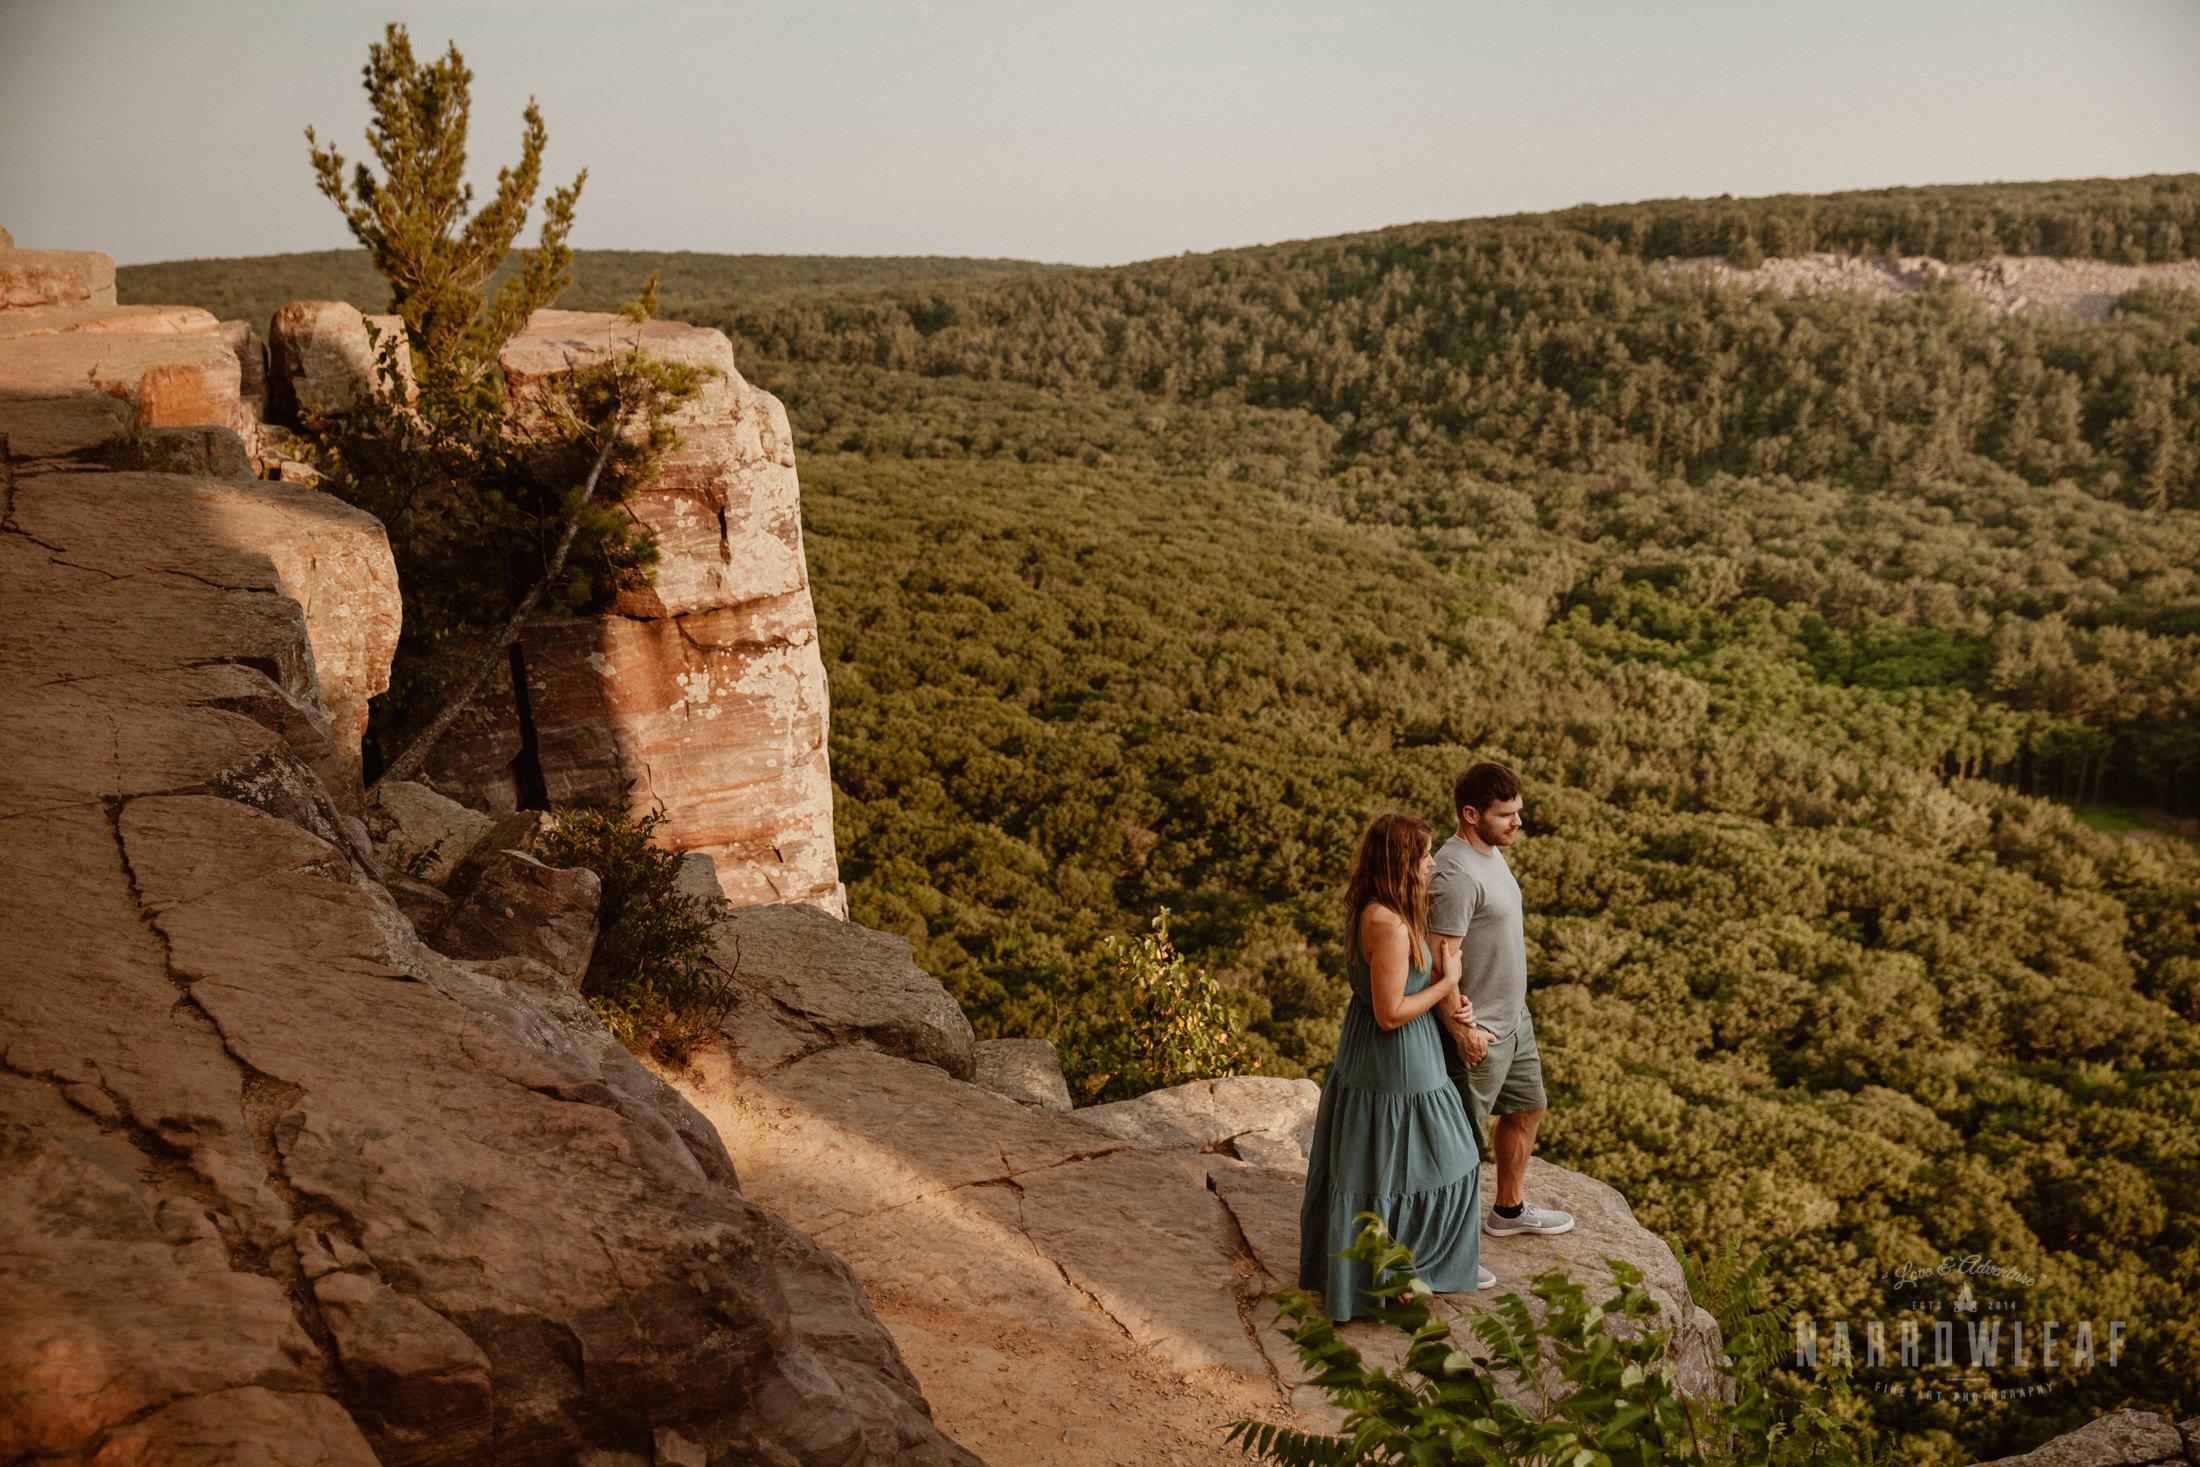 wedding-adventure-photographer-Narrowleaf_Love_and_Adventure_Photography-9359.jpg